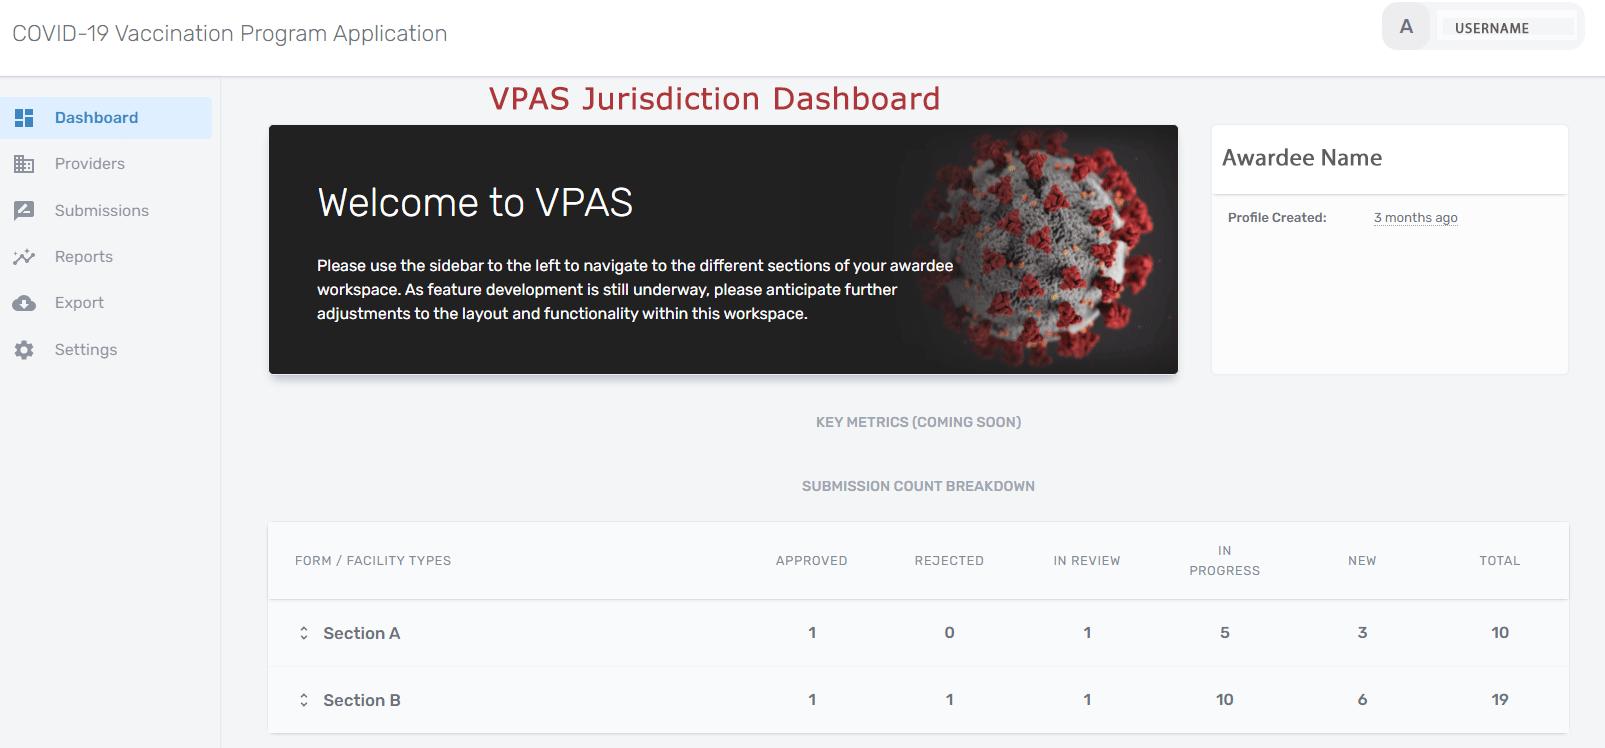 VPAS Jurisdiction Dashboard